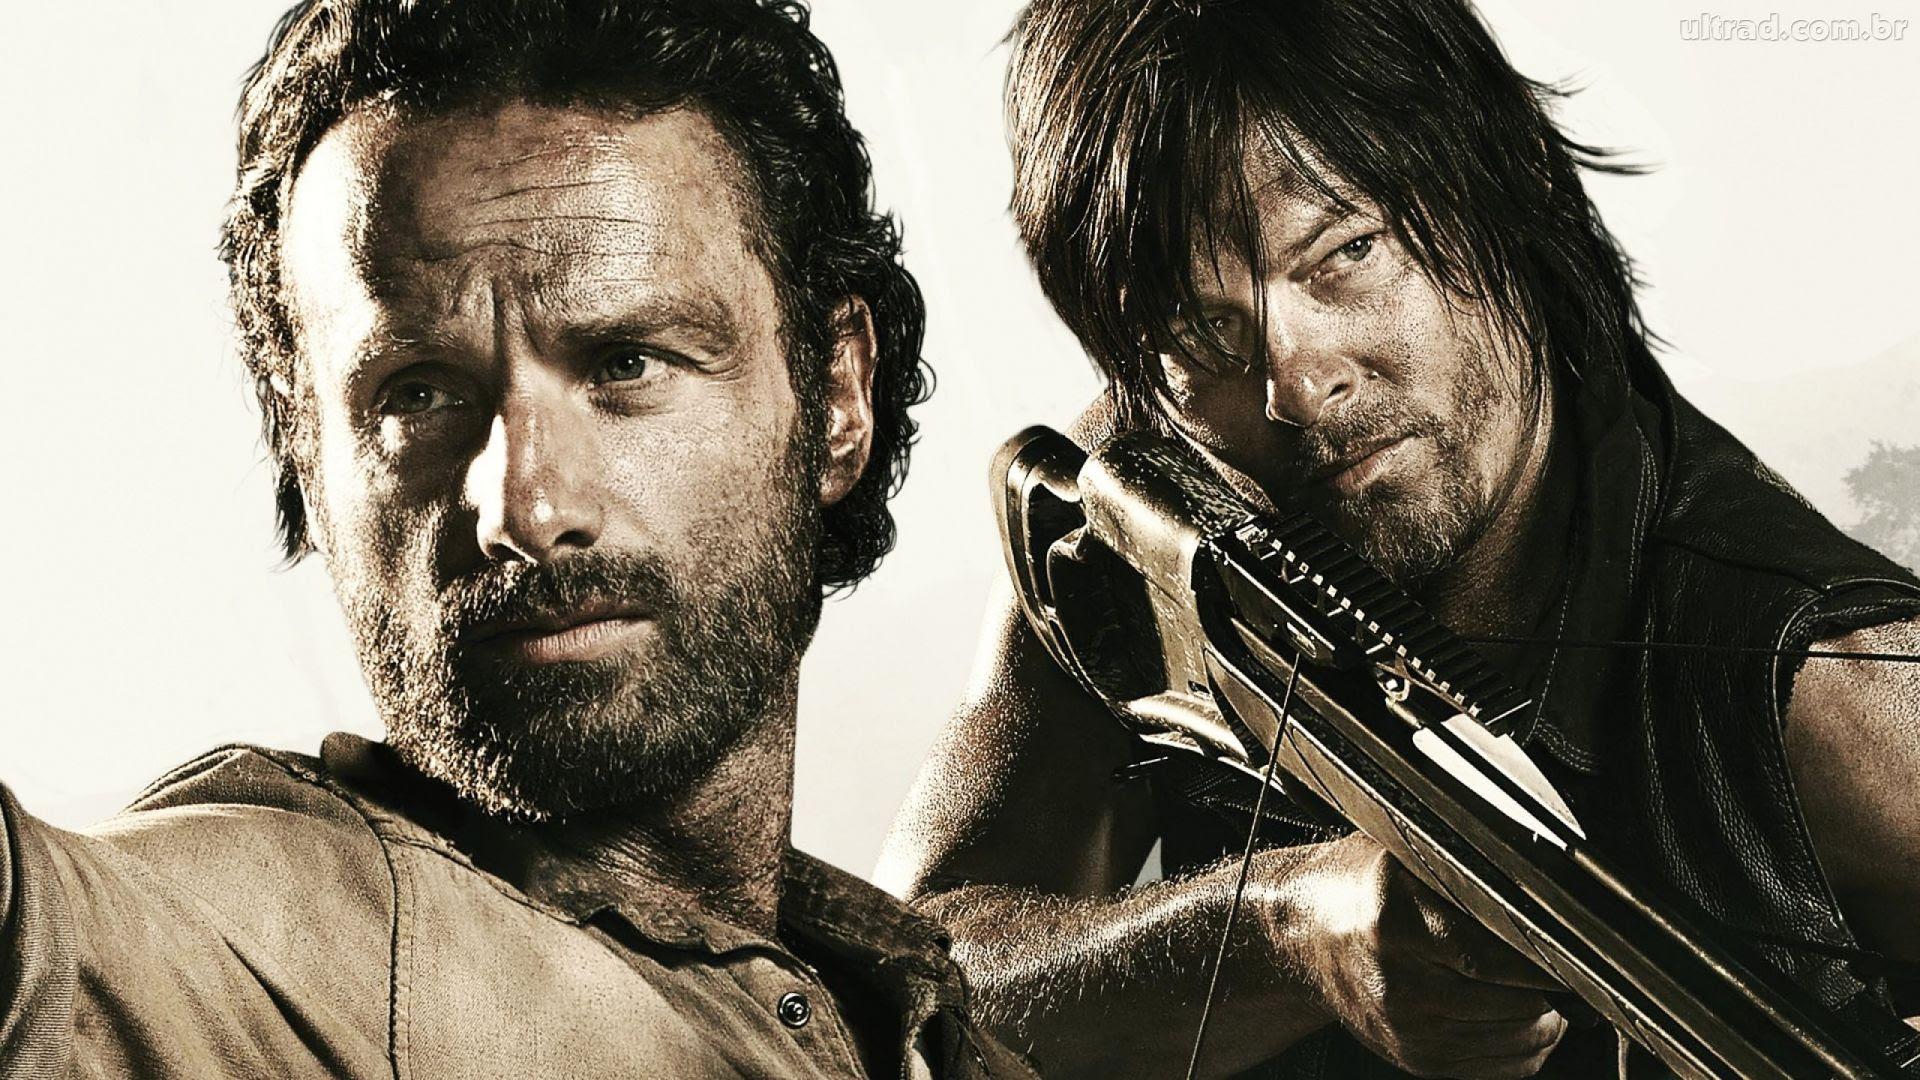 Daryl The Walking Dead Wallpaper 1920x1080 56733